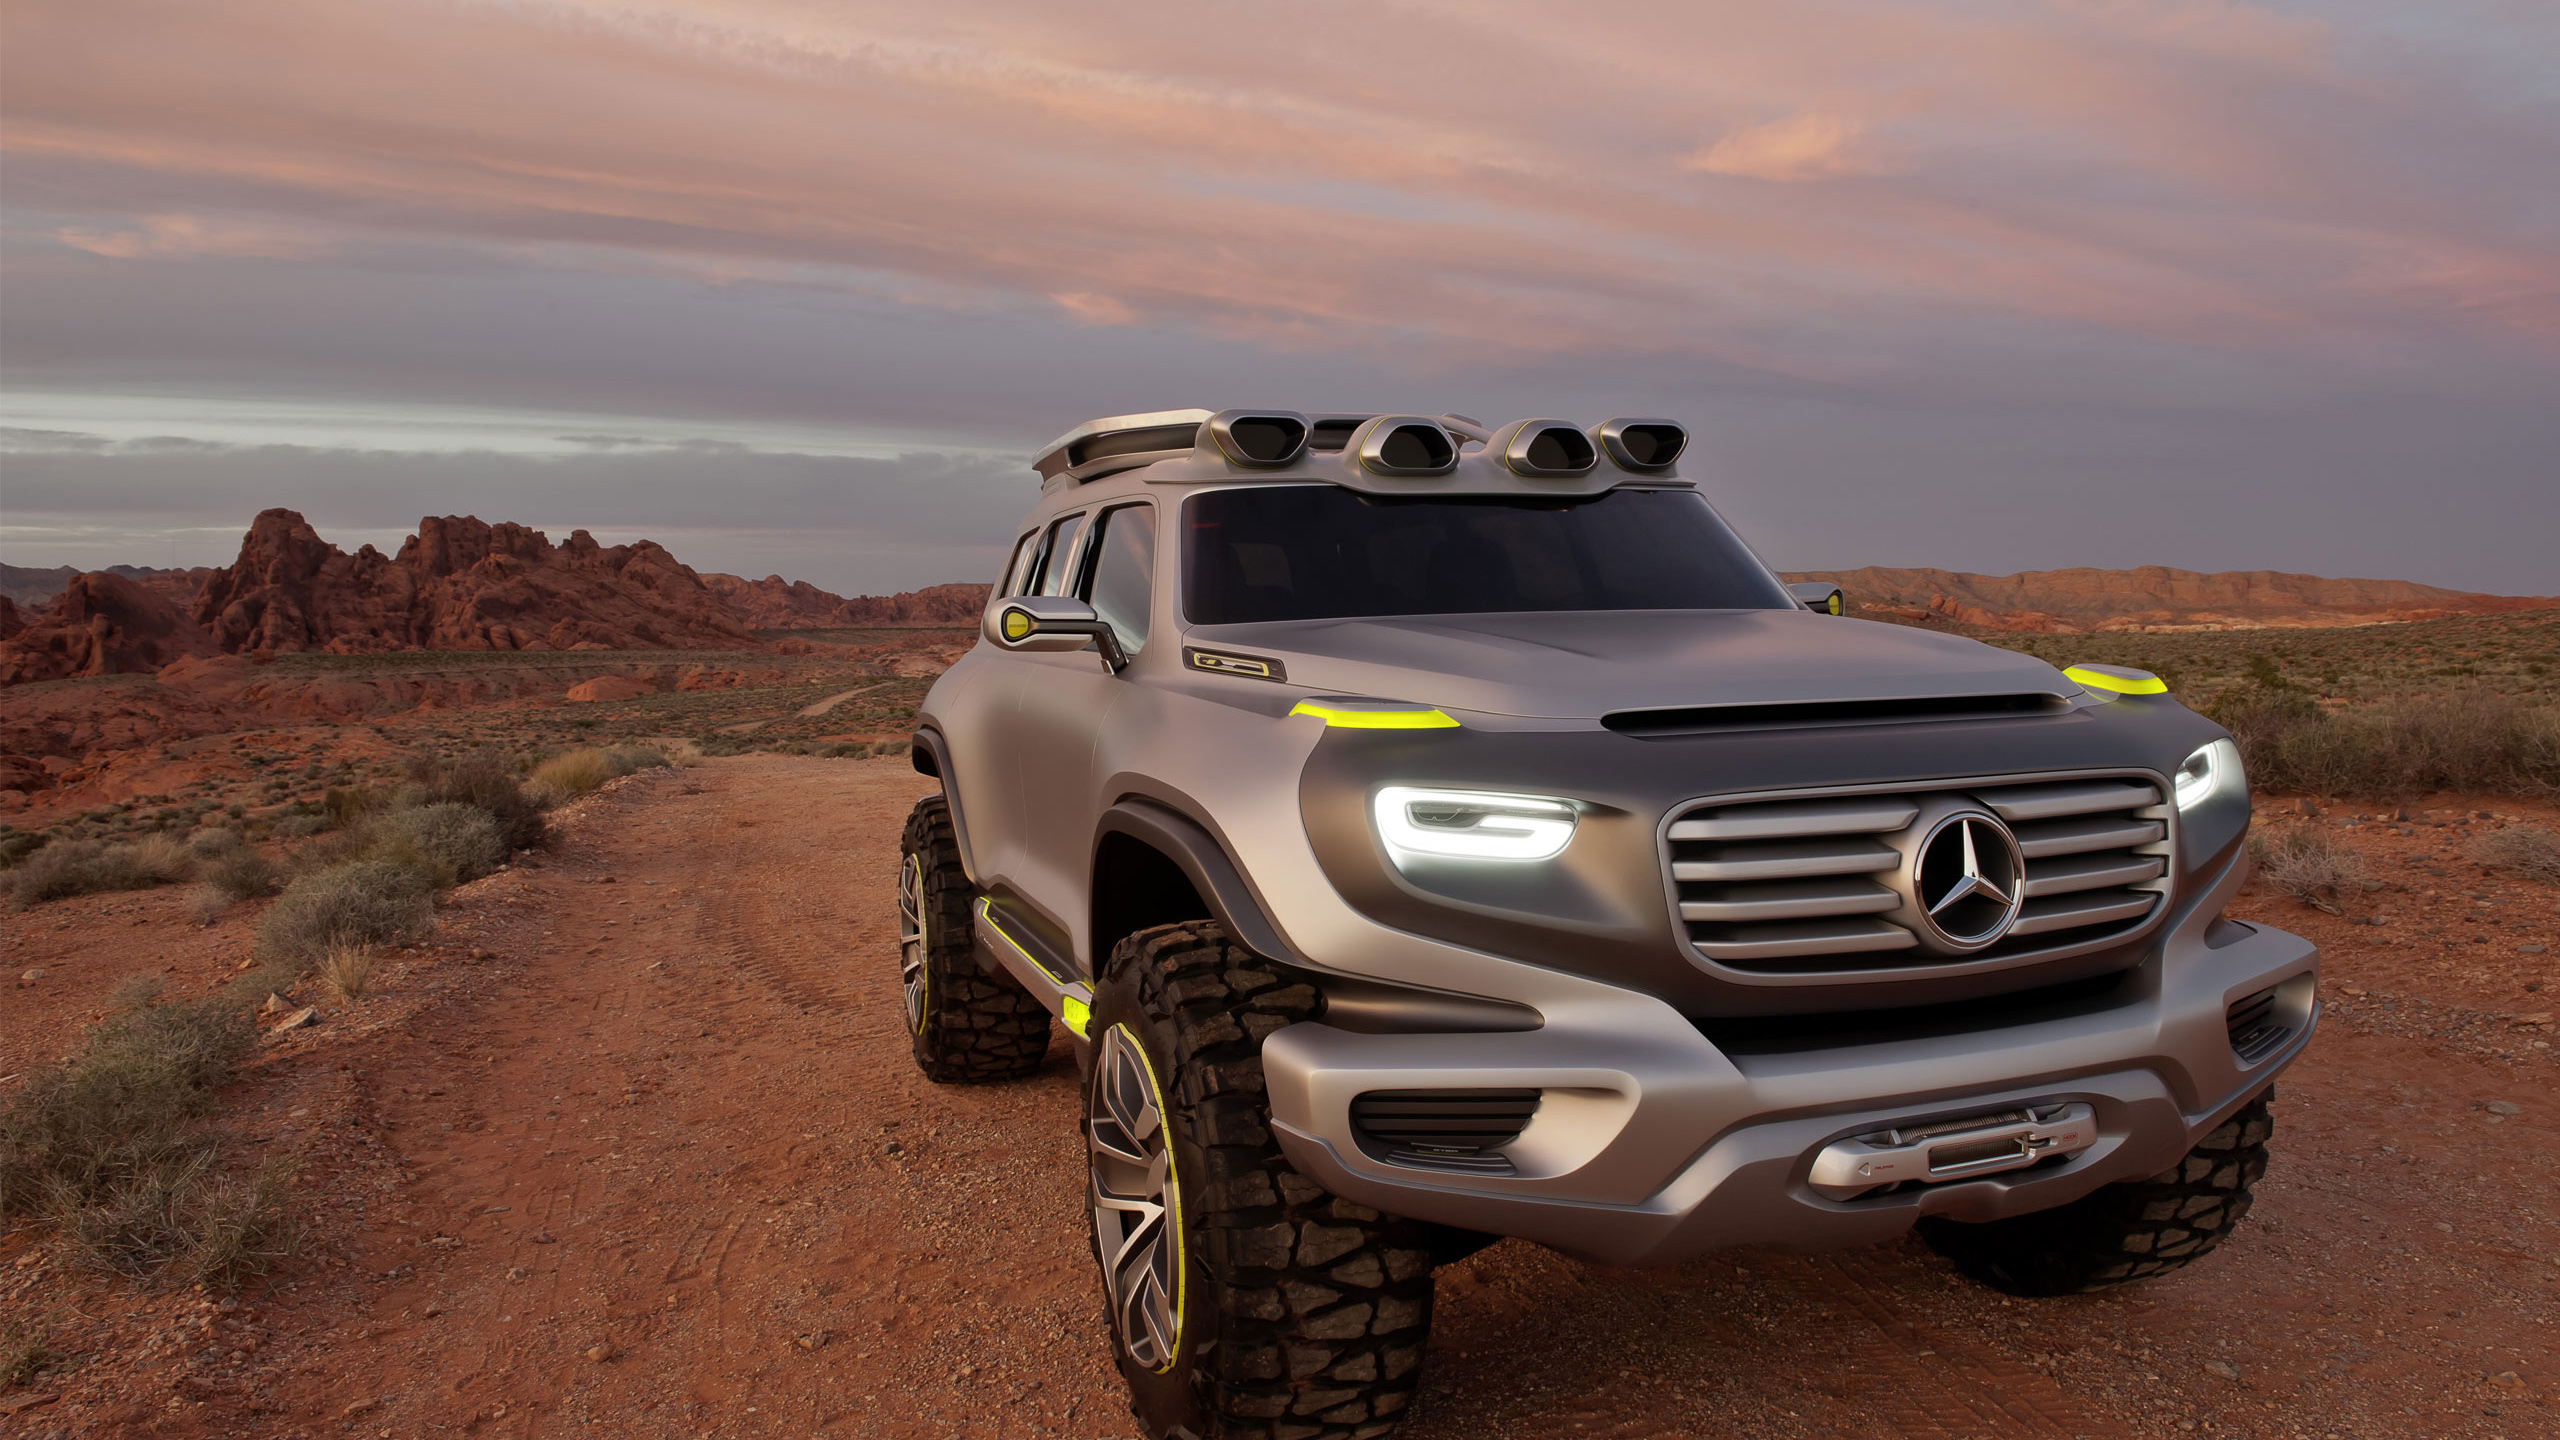 2017 Mercedes-Benz Unimog - 2017 Best Cars HD Gallery